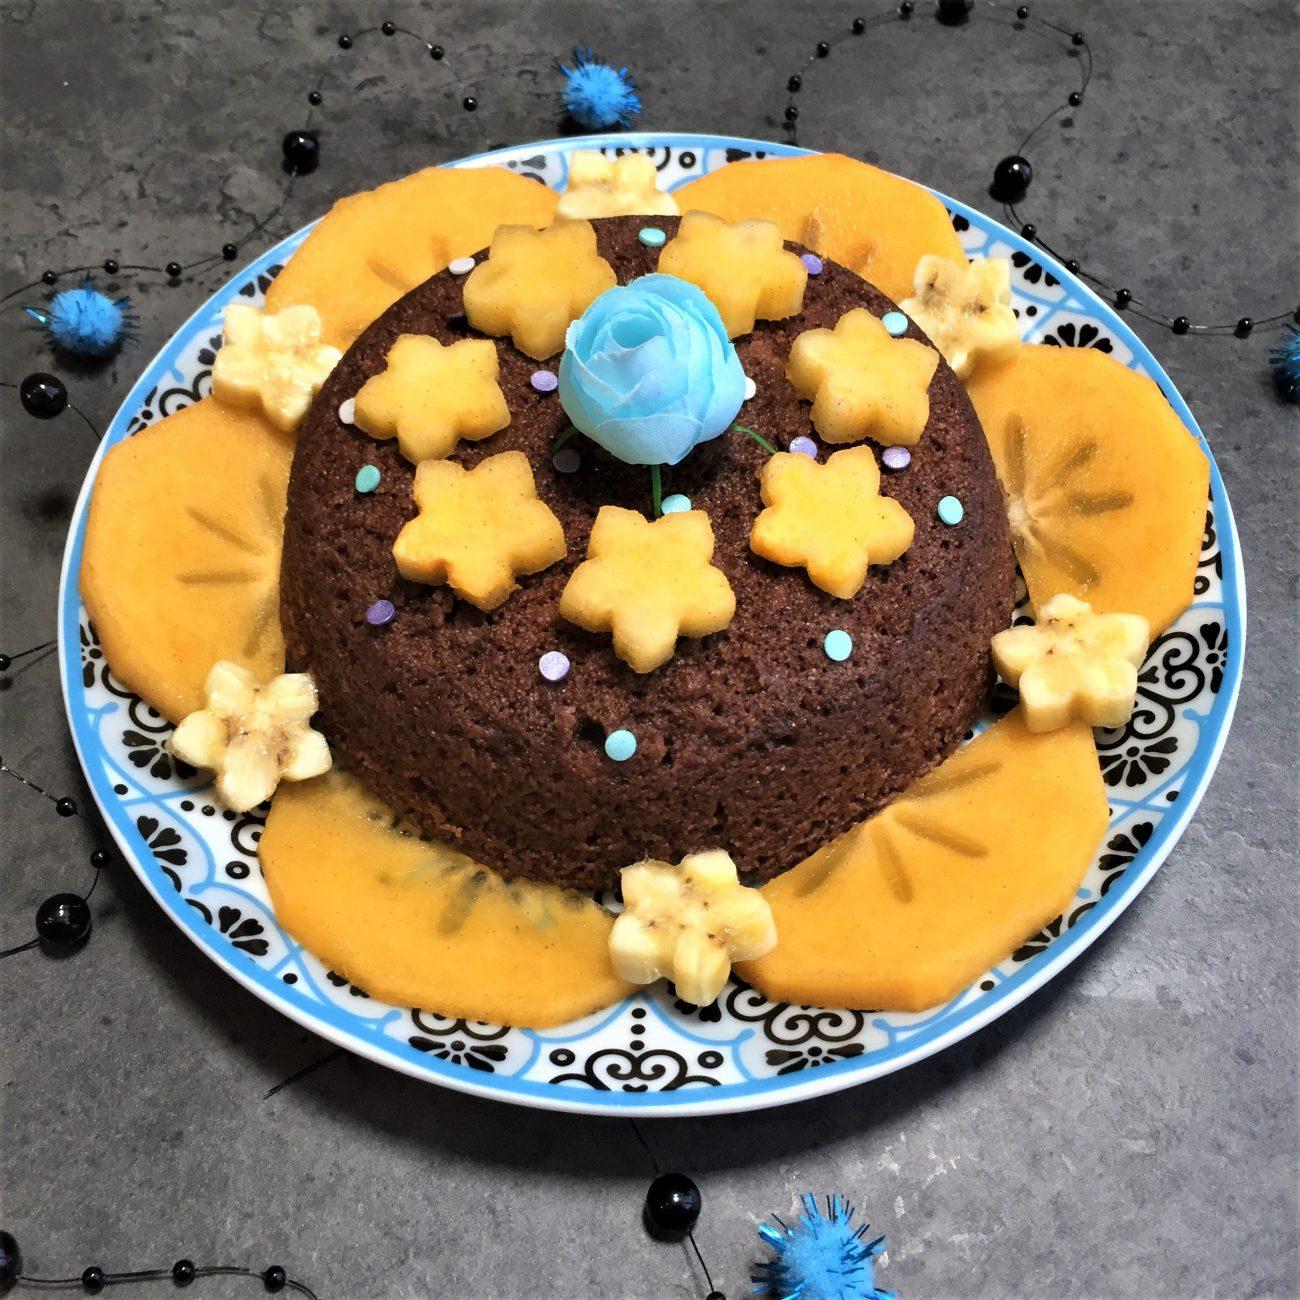 Bowlcake semoule cacao